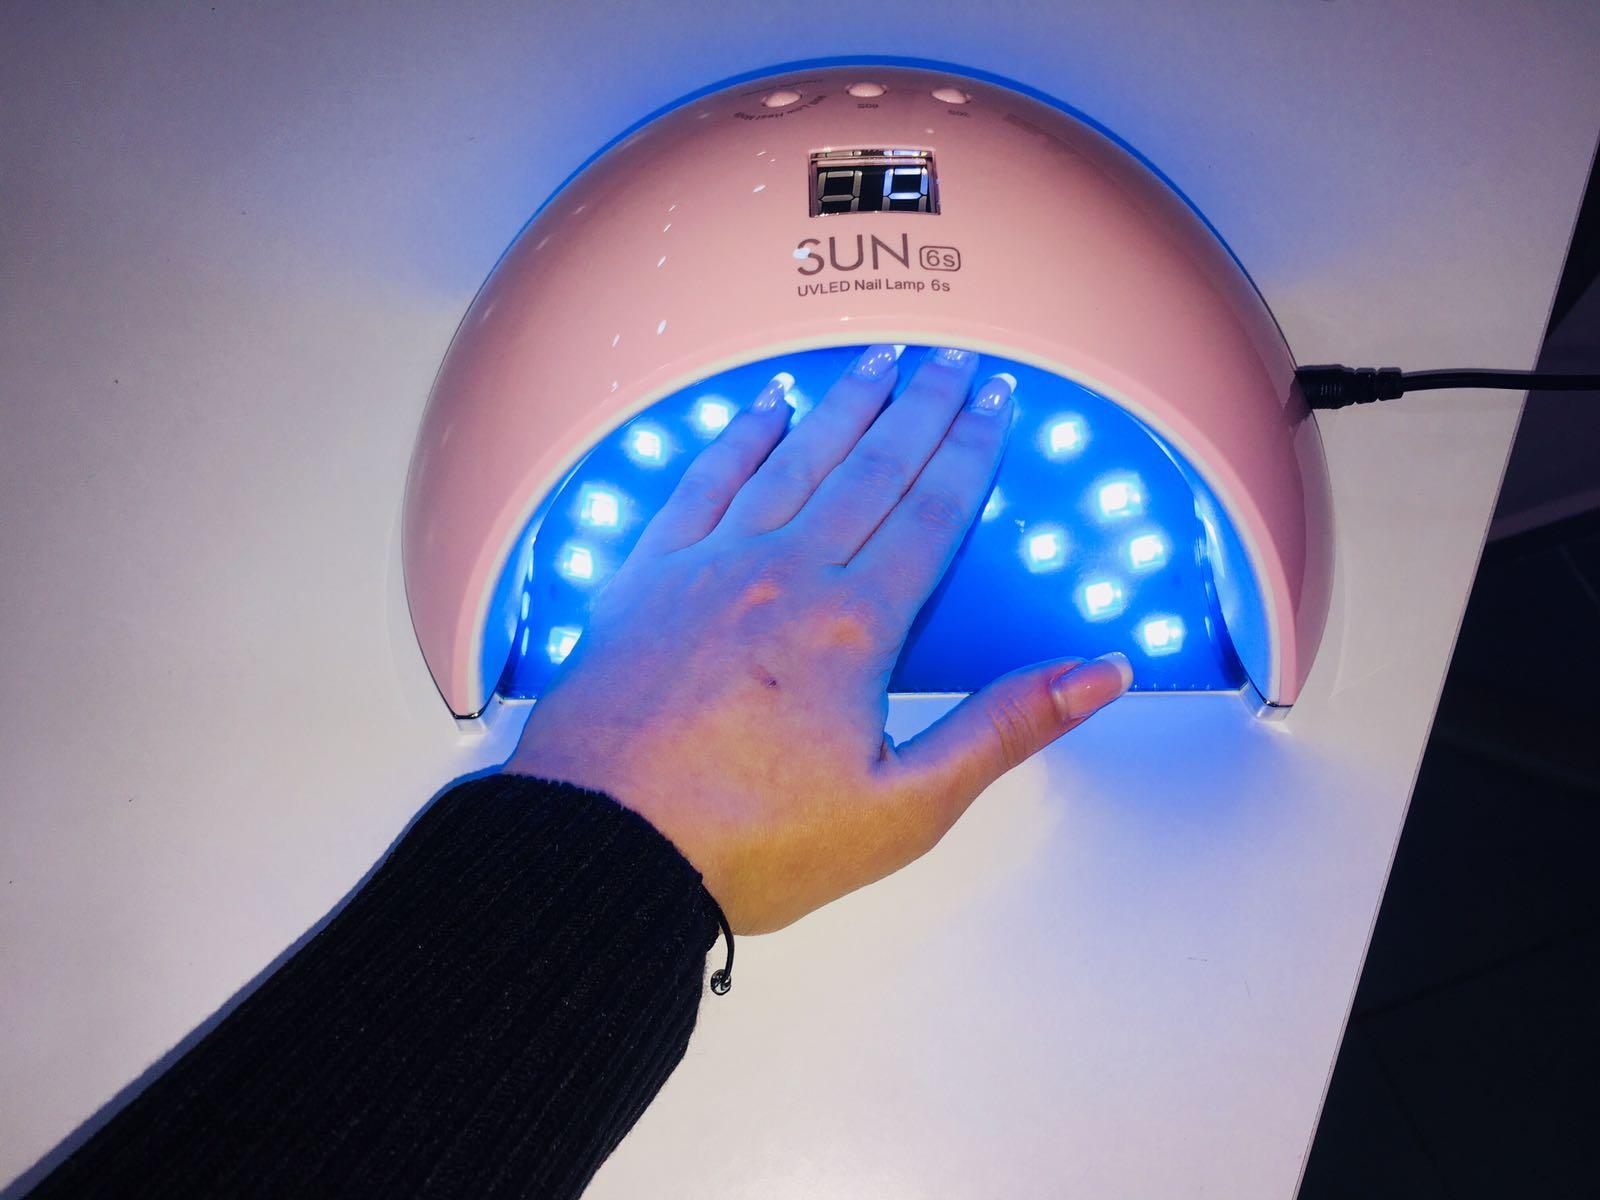 lámpara led 48 w uñas